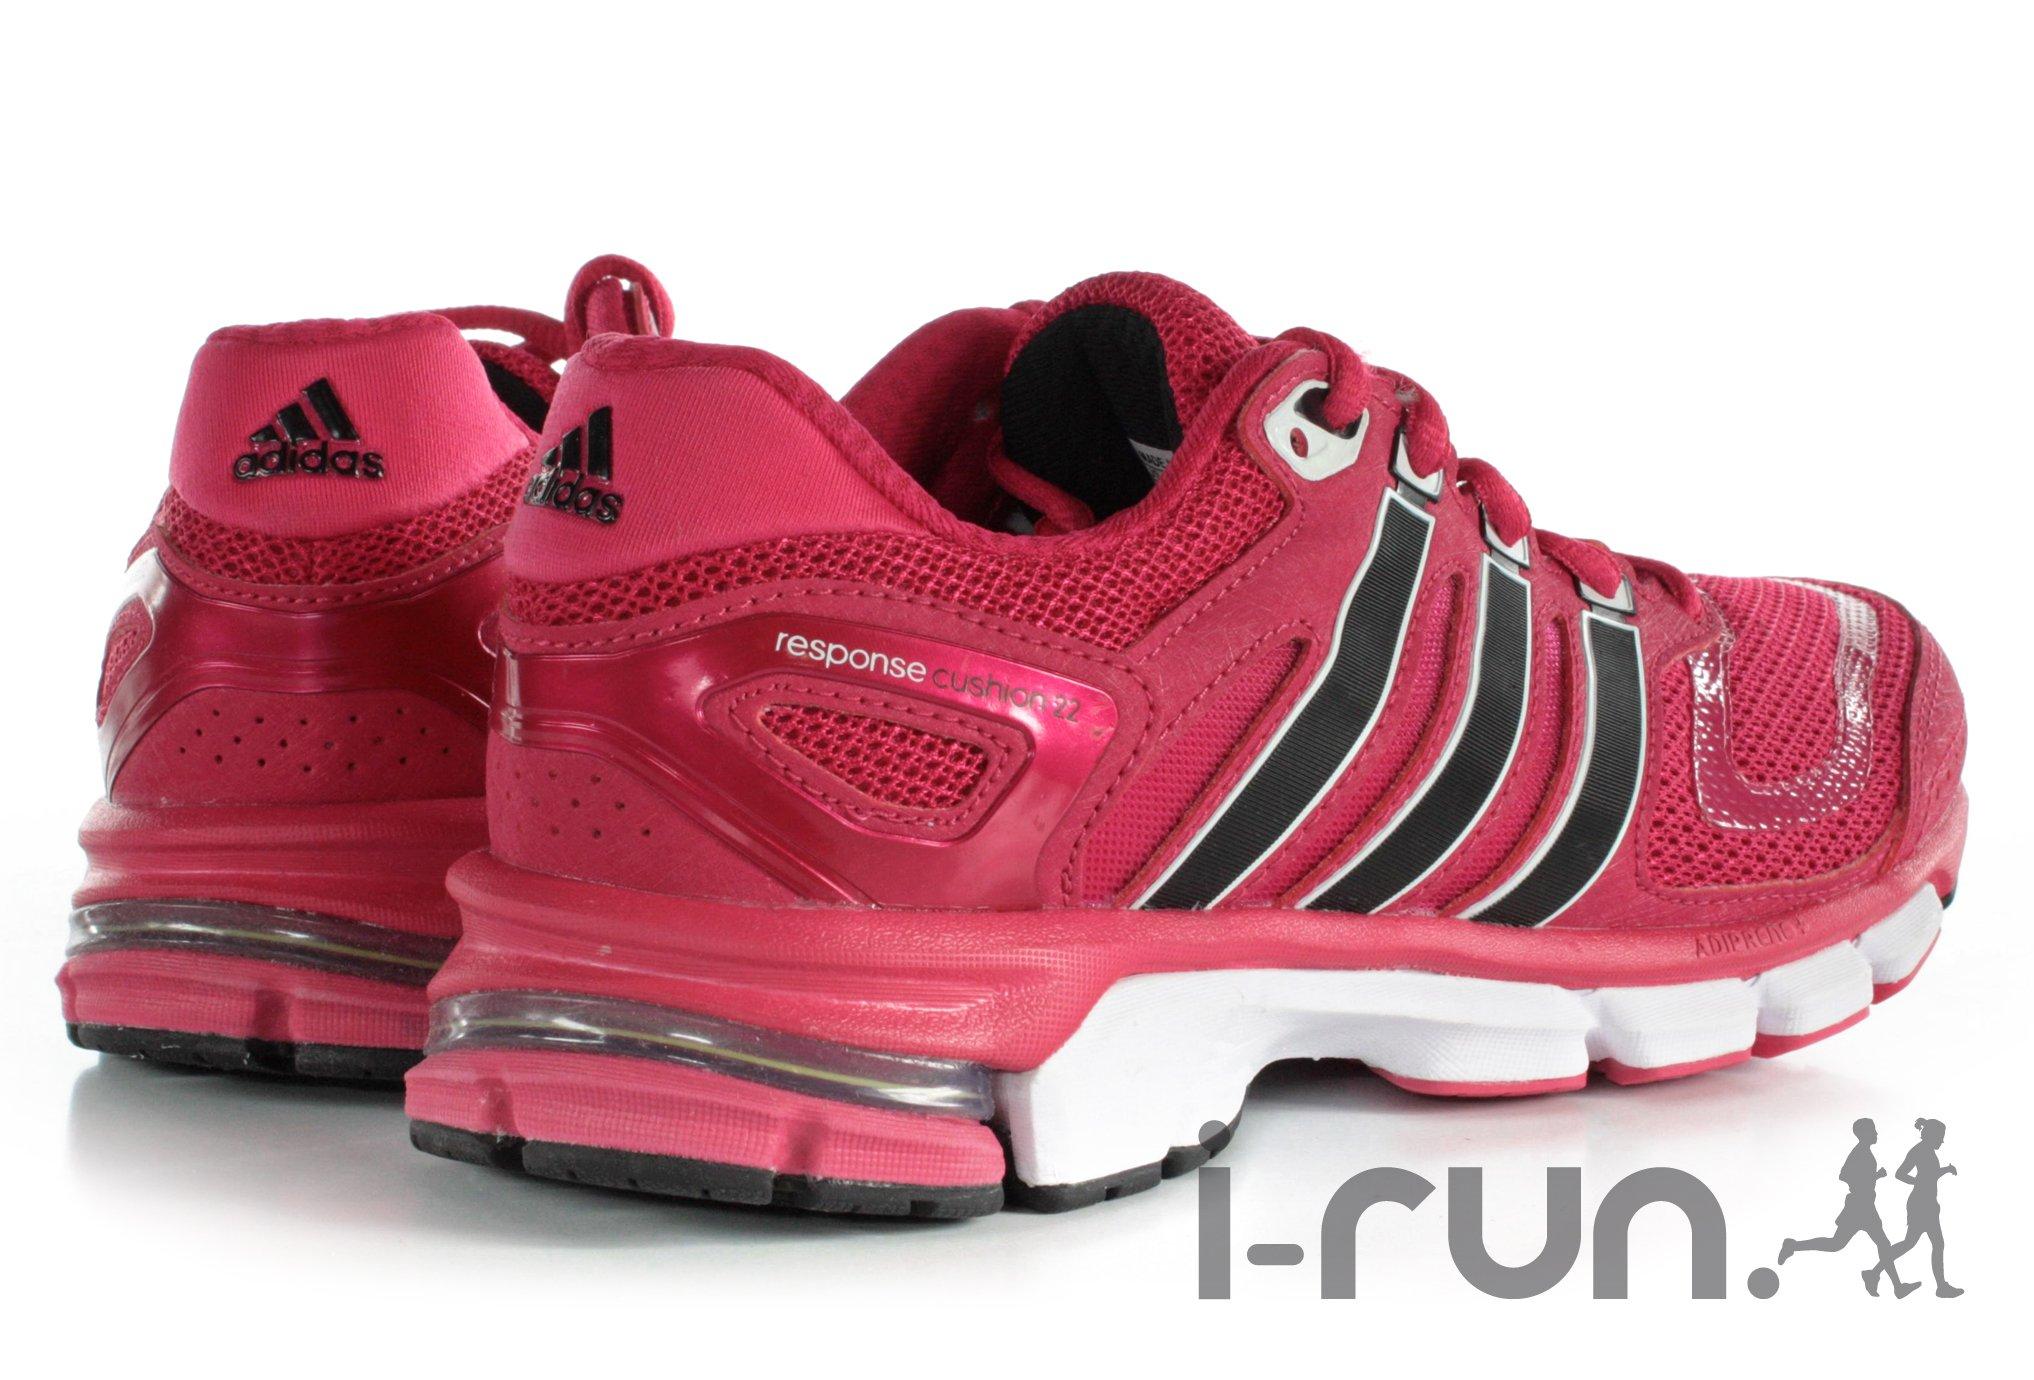 Dwbngc Fhrraxb Rose Chaussures Blanc Response Femme Running Adidas wSgAPq